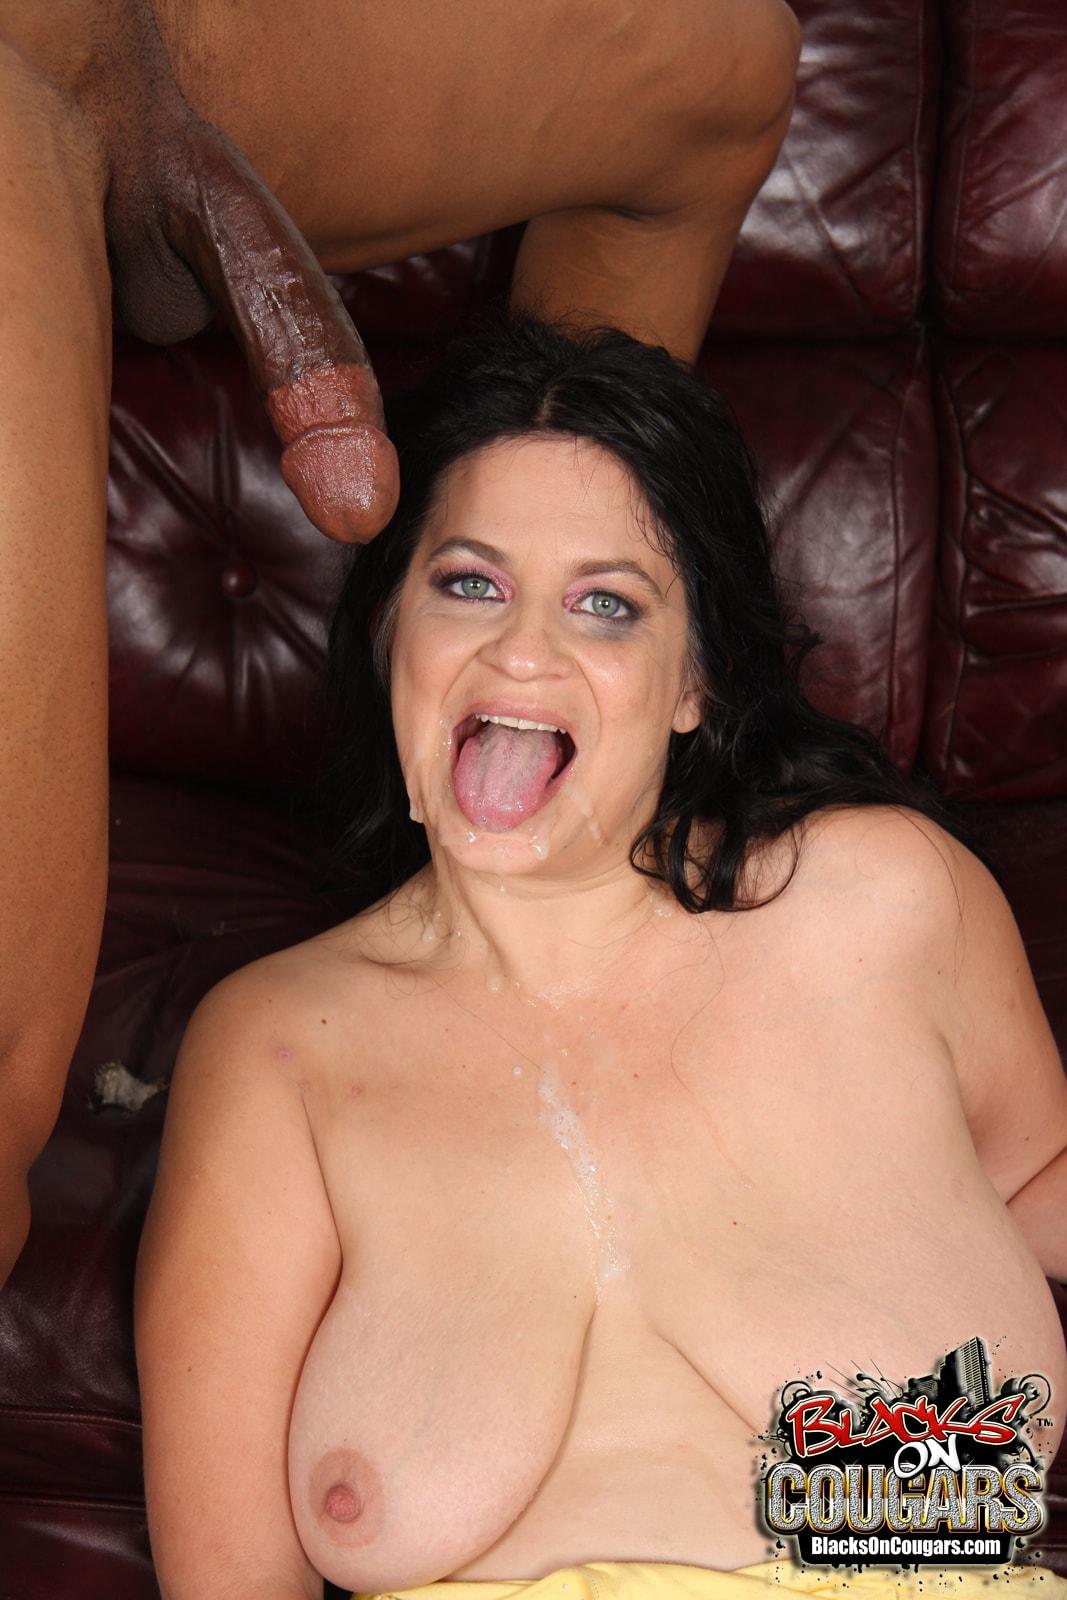 Dogfart '- Blacks On Cougars' starring Slut Deb (Photo 28)